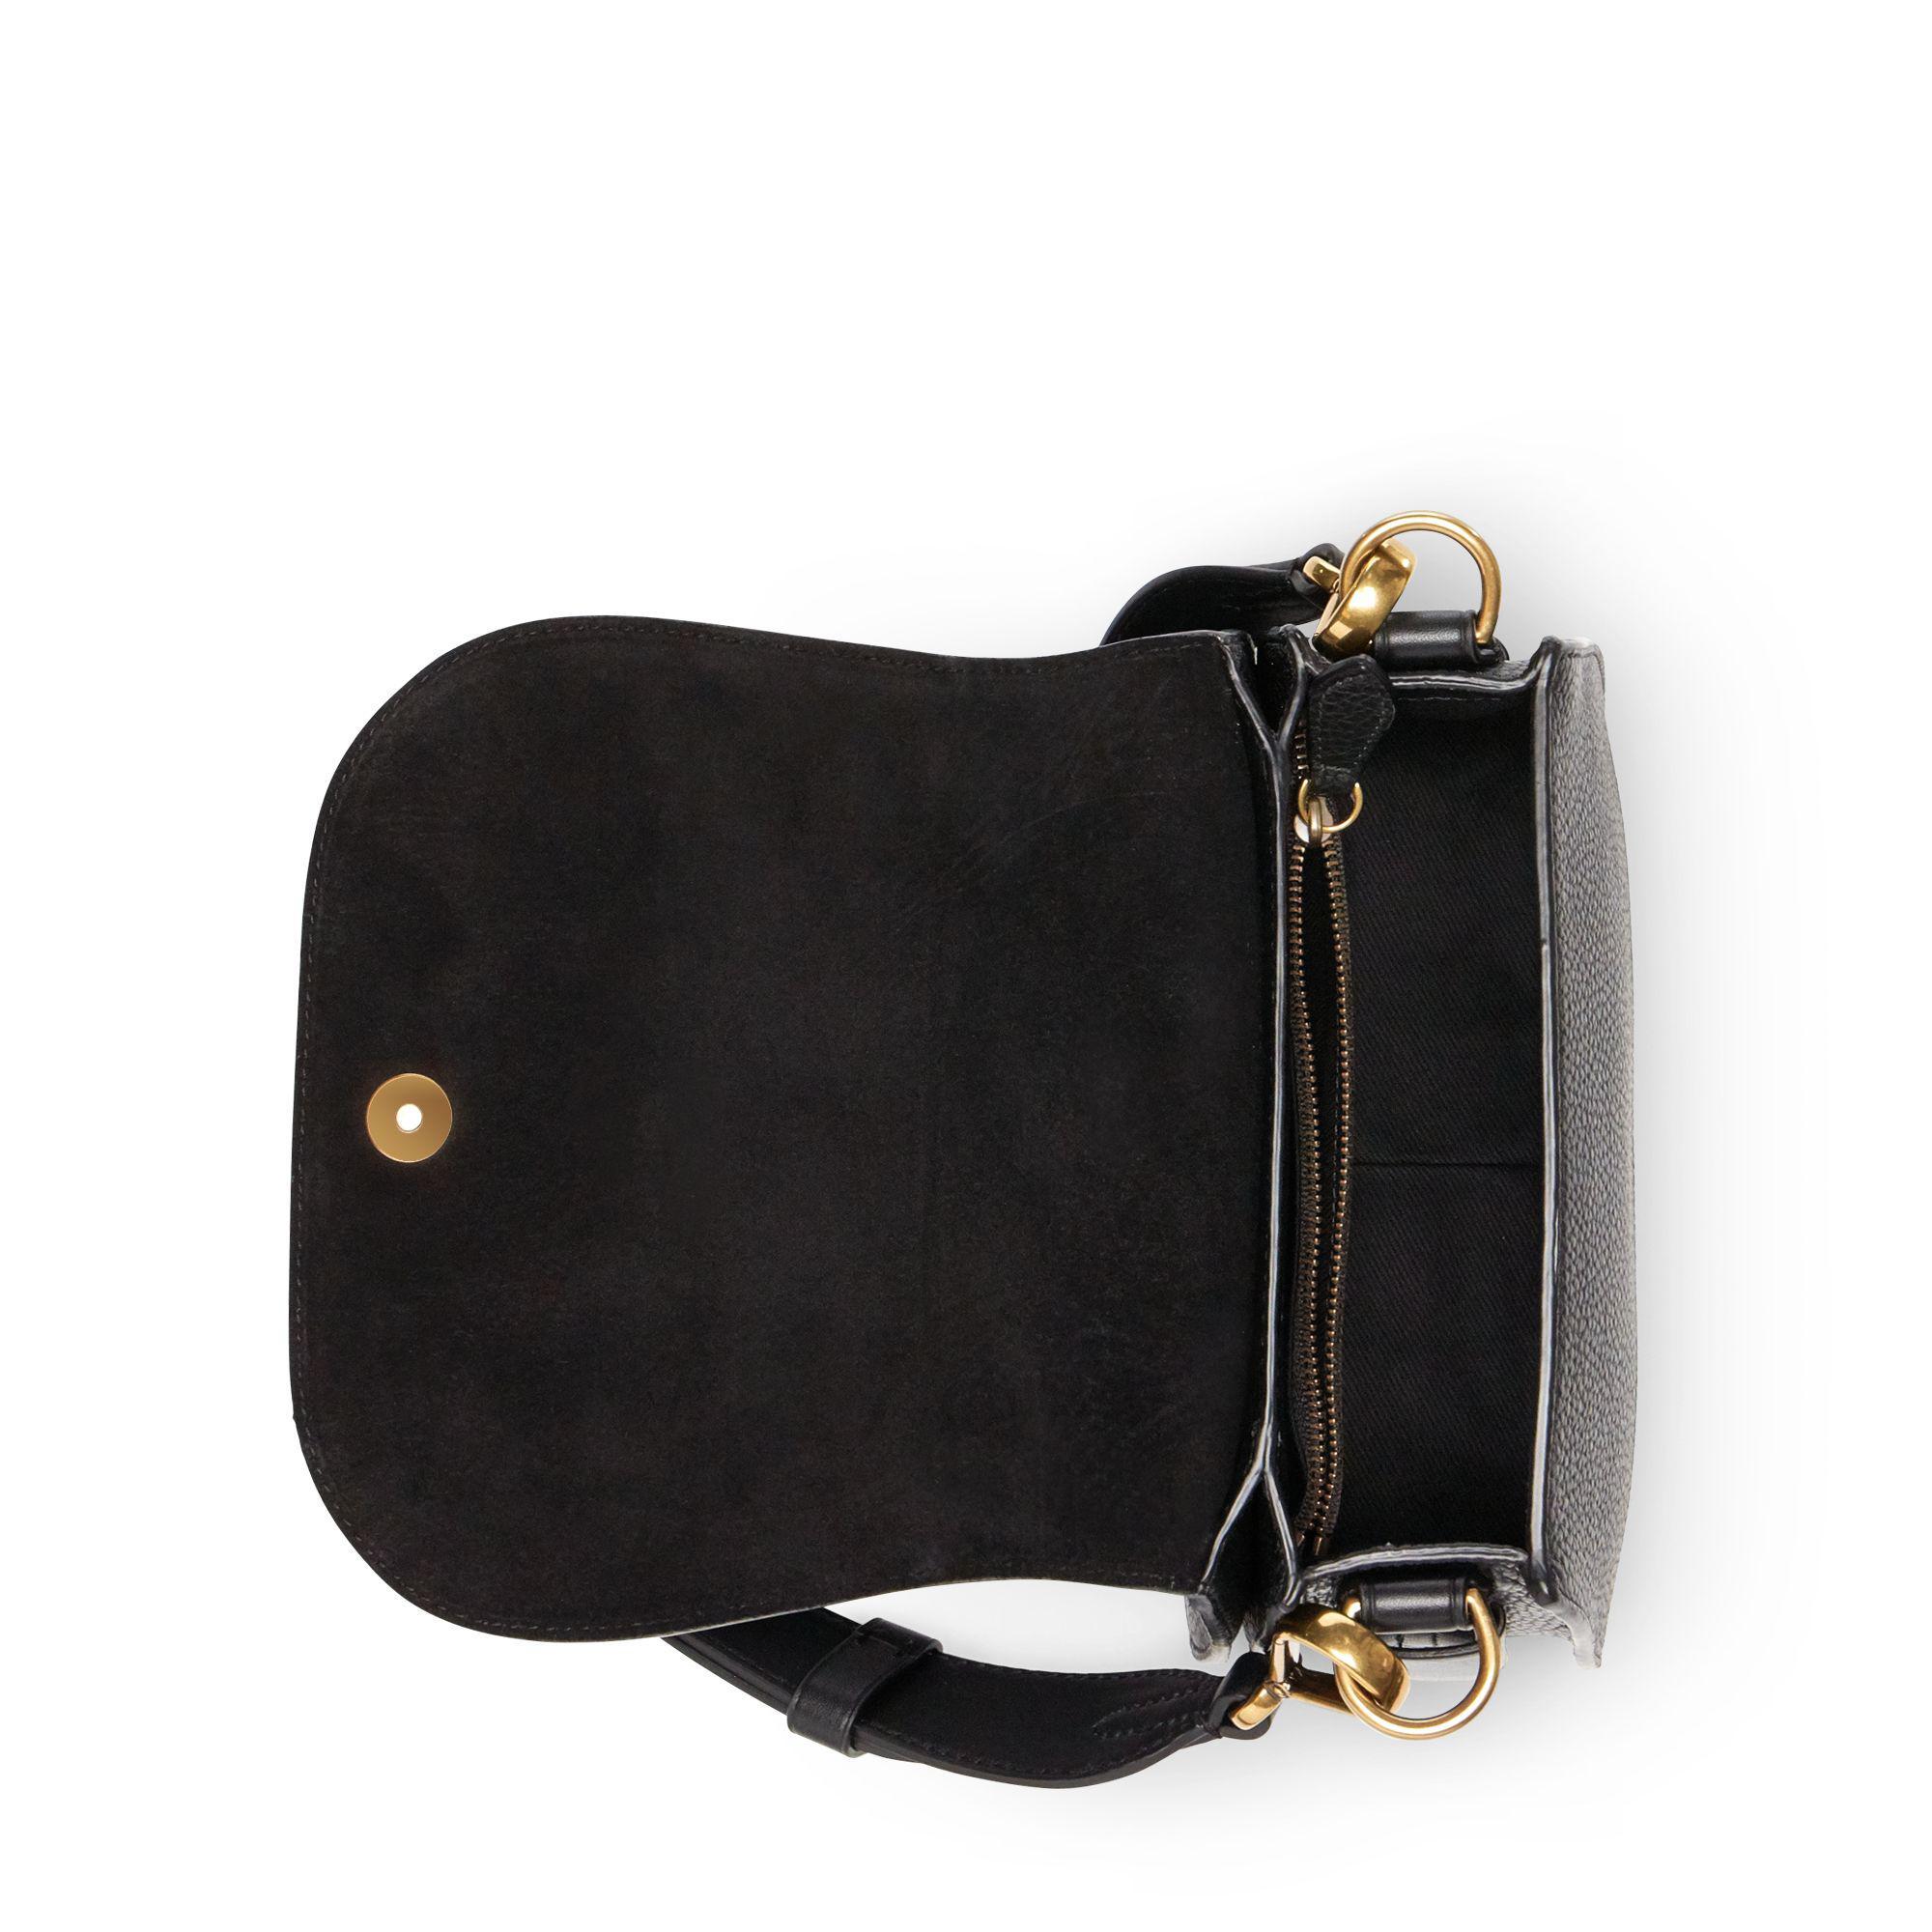 Polo Ralph Lauren - Black Pebbled Leather Lennox Bag - Lyst. View fullscreen c5005540e7